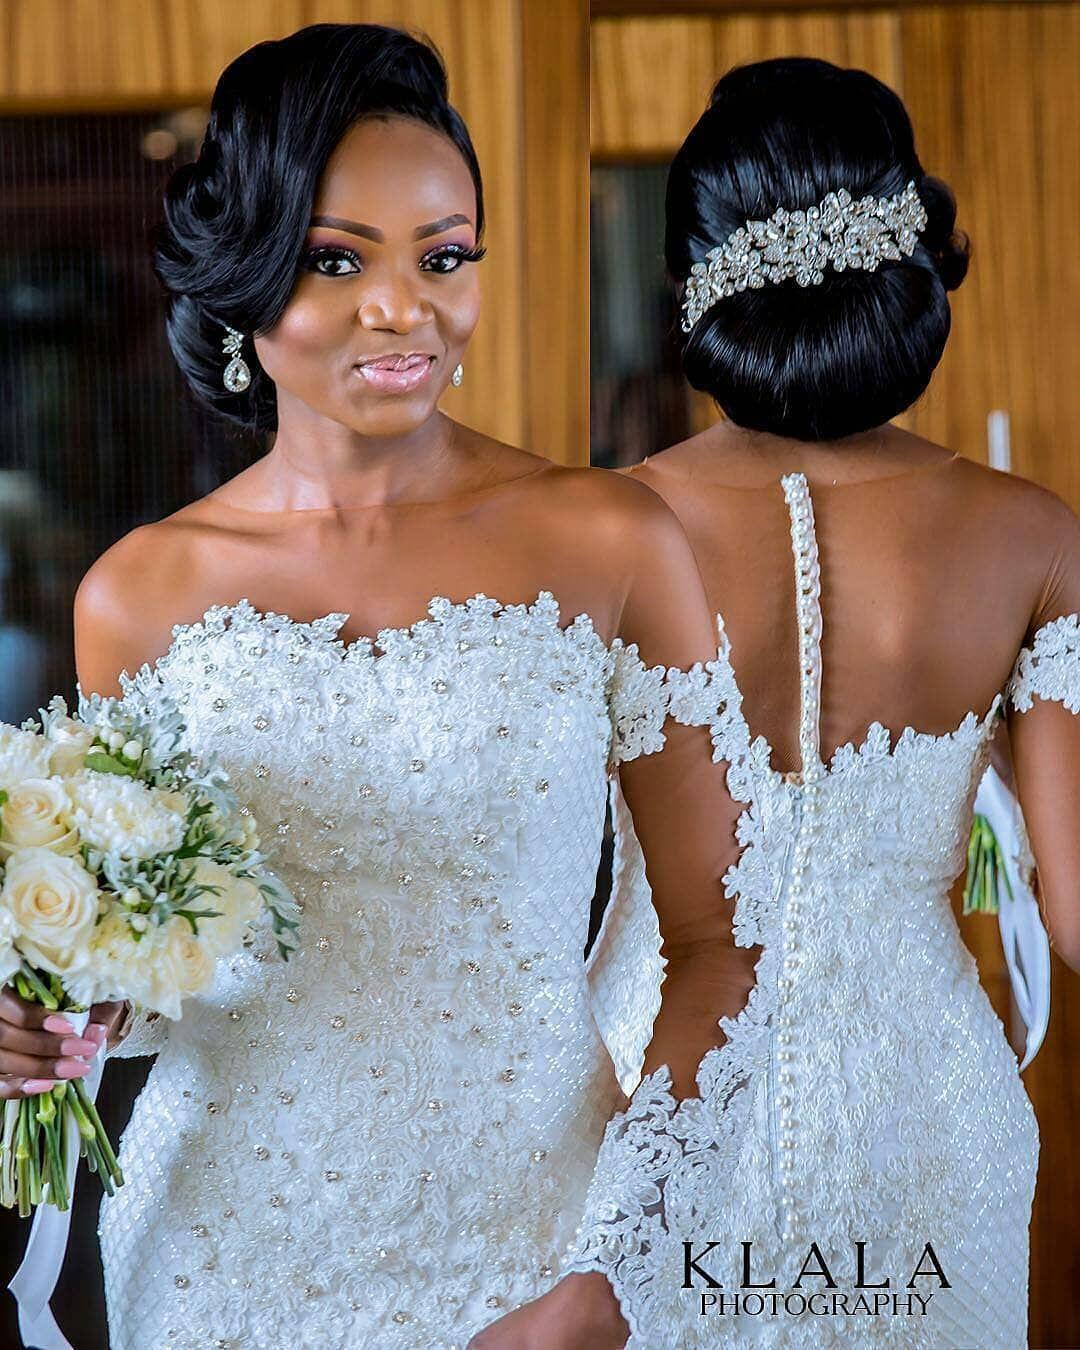 Onald17 Photo Klalaphotography Makeup Banksbmpro Bride S Dress Aprilbykunbi Groom S Wedding Dresses Lace Trumpet Wedding Gown Black Wedding Hairstyles